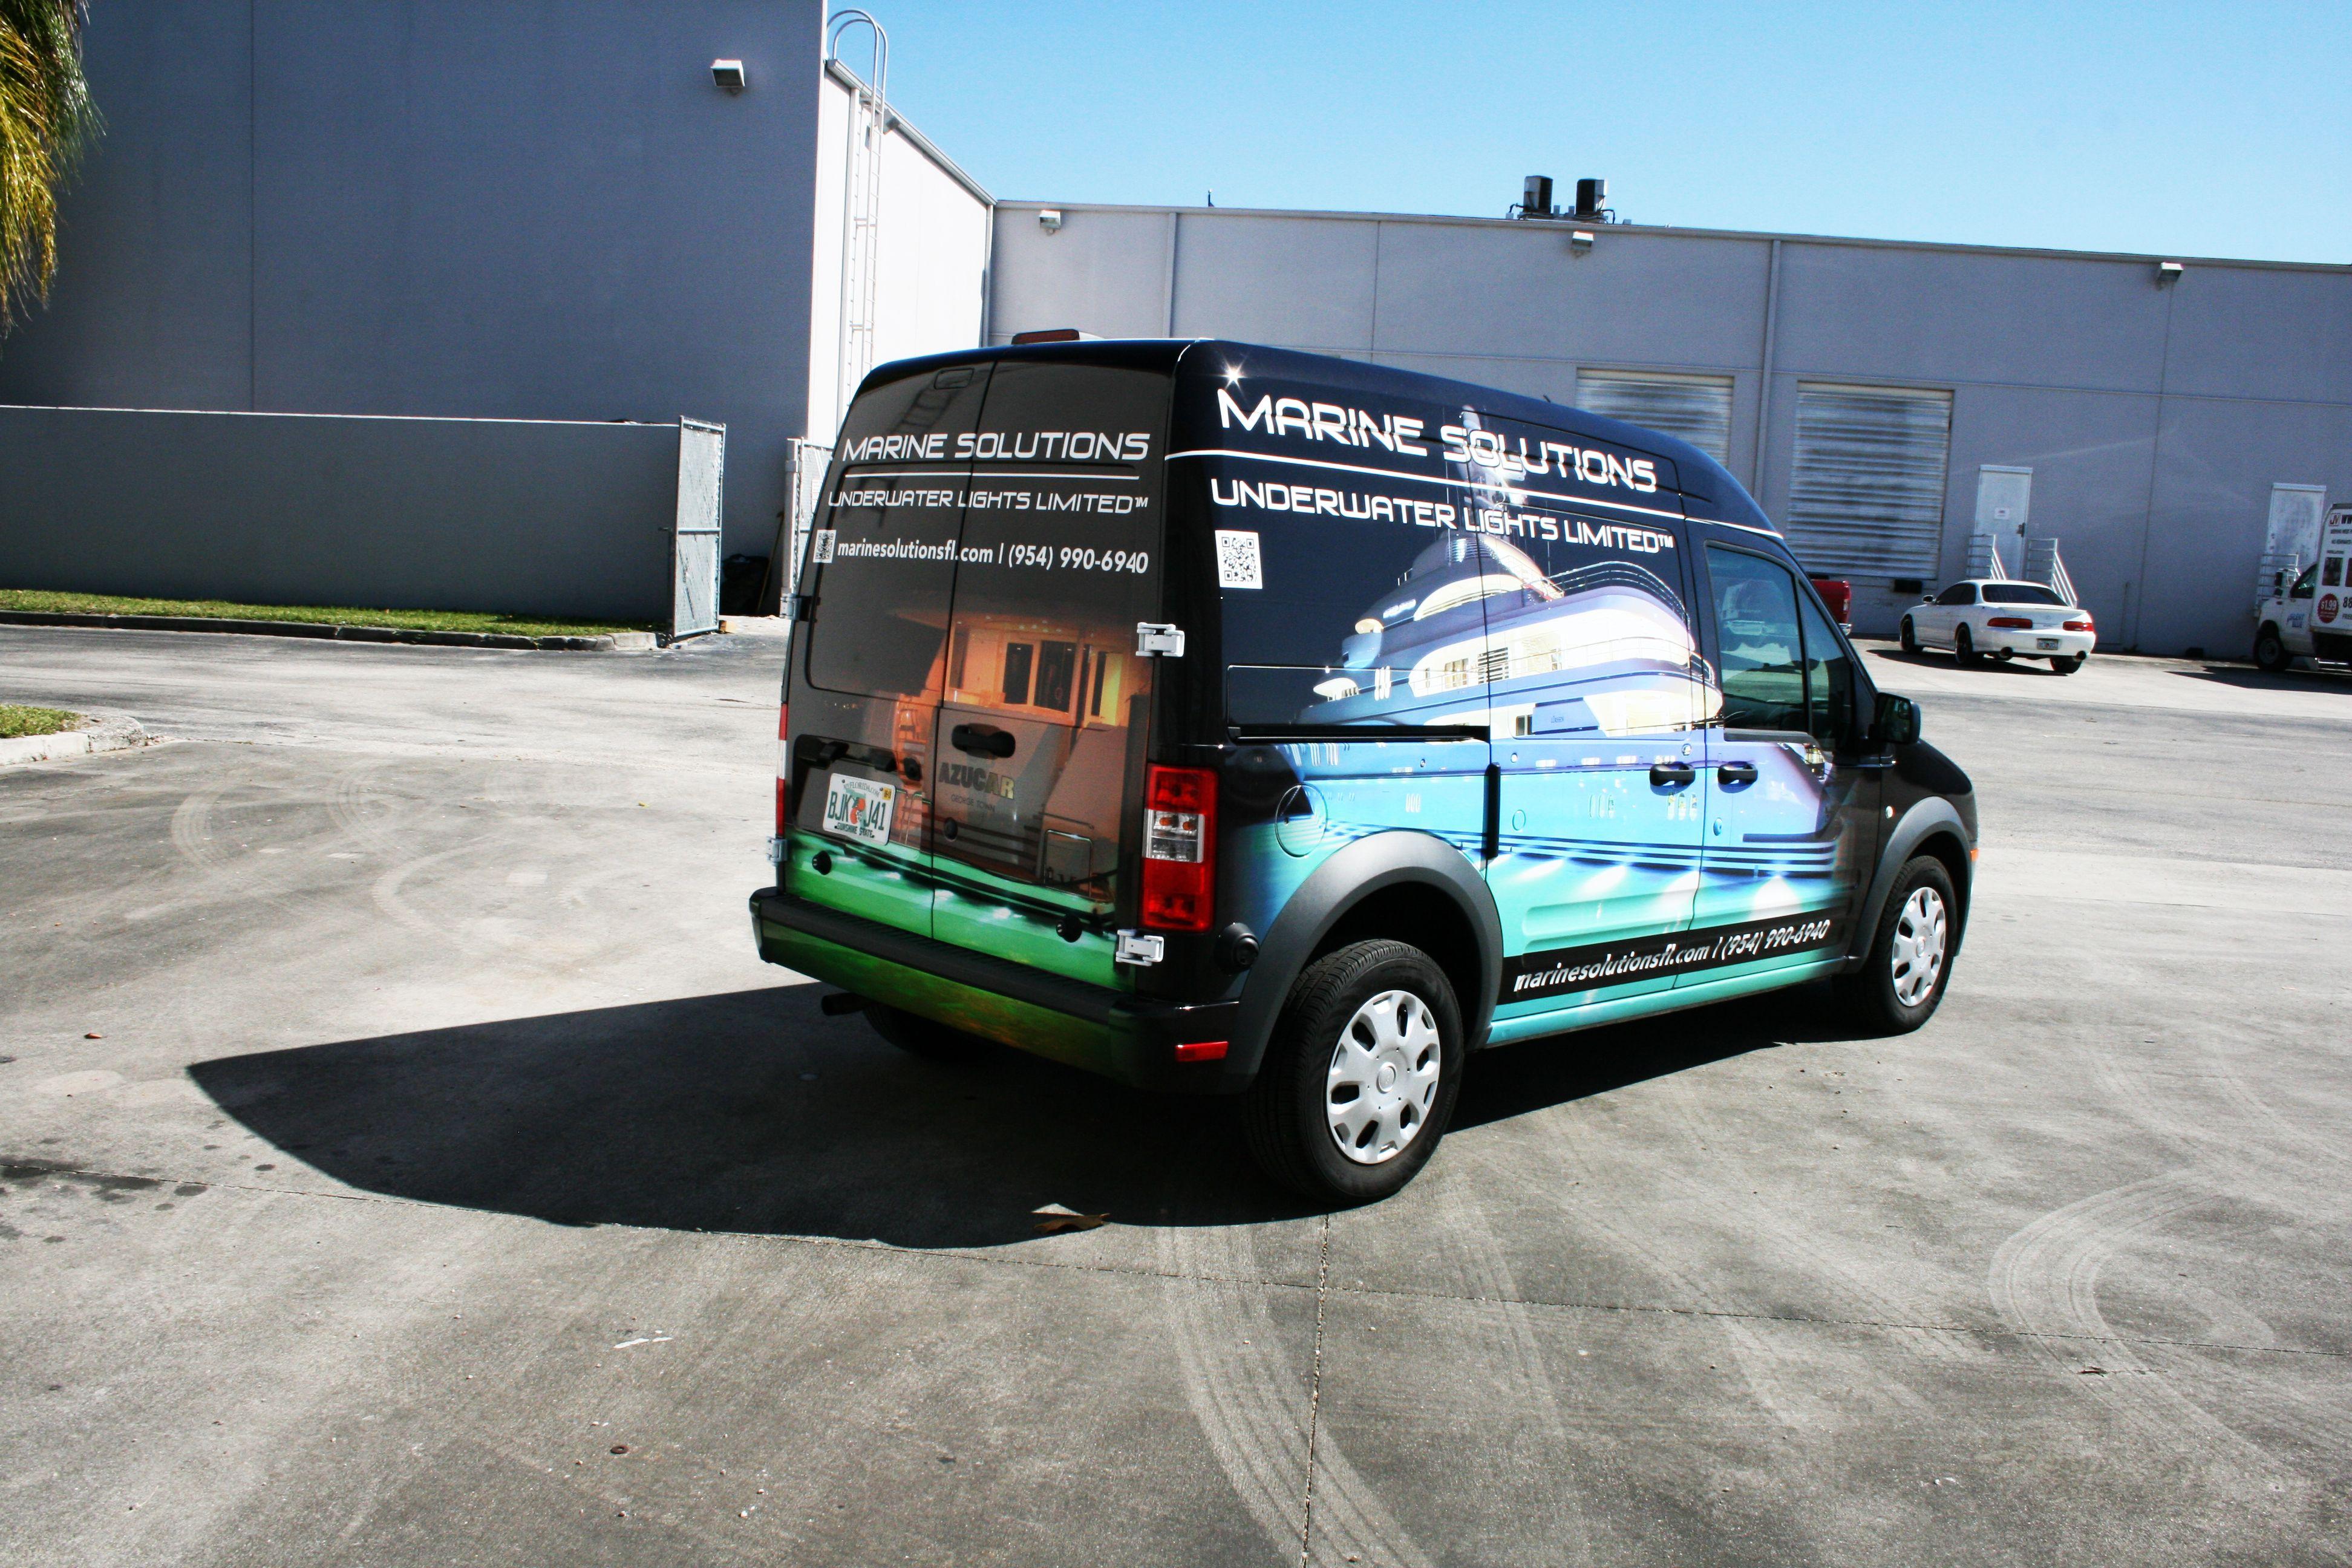 Ford transit connect vinyl van wrap davie florida marine solutions http www